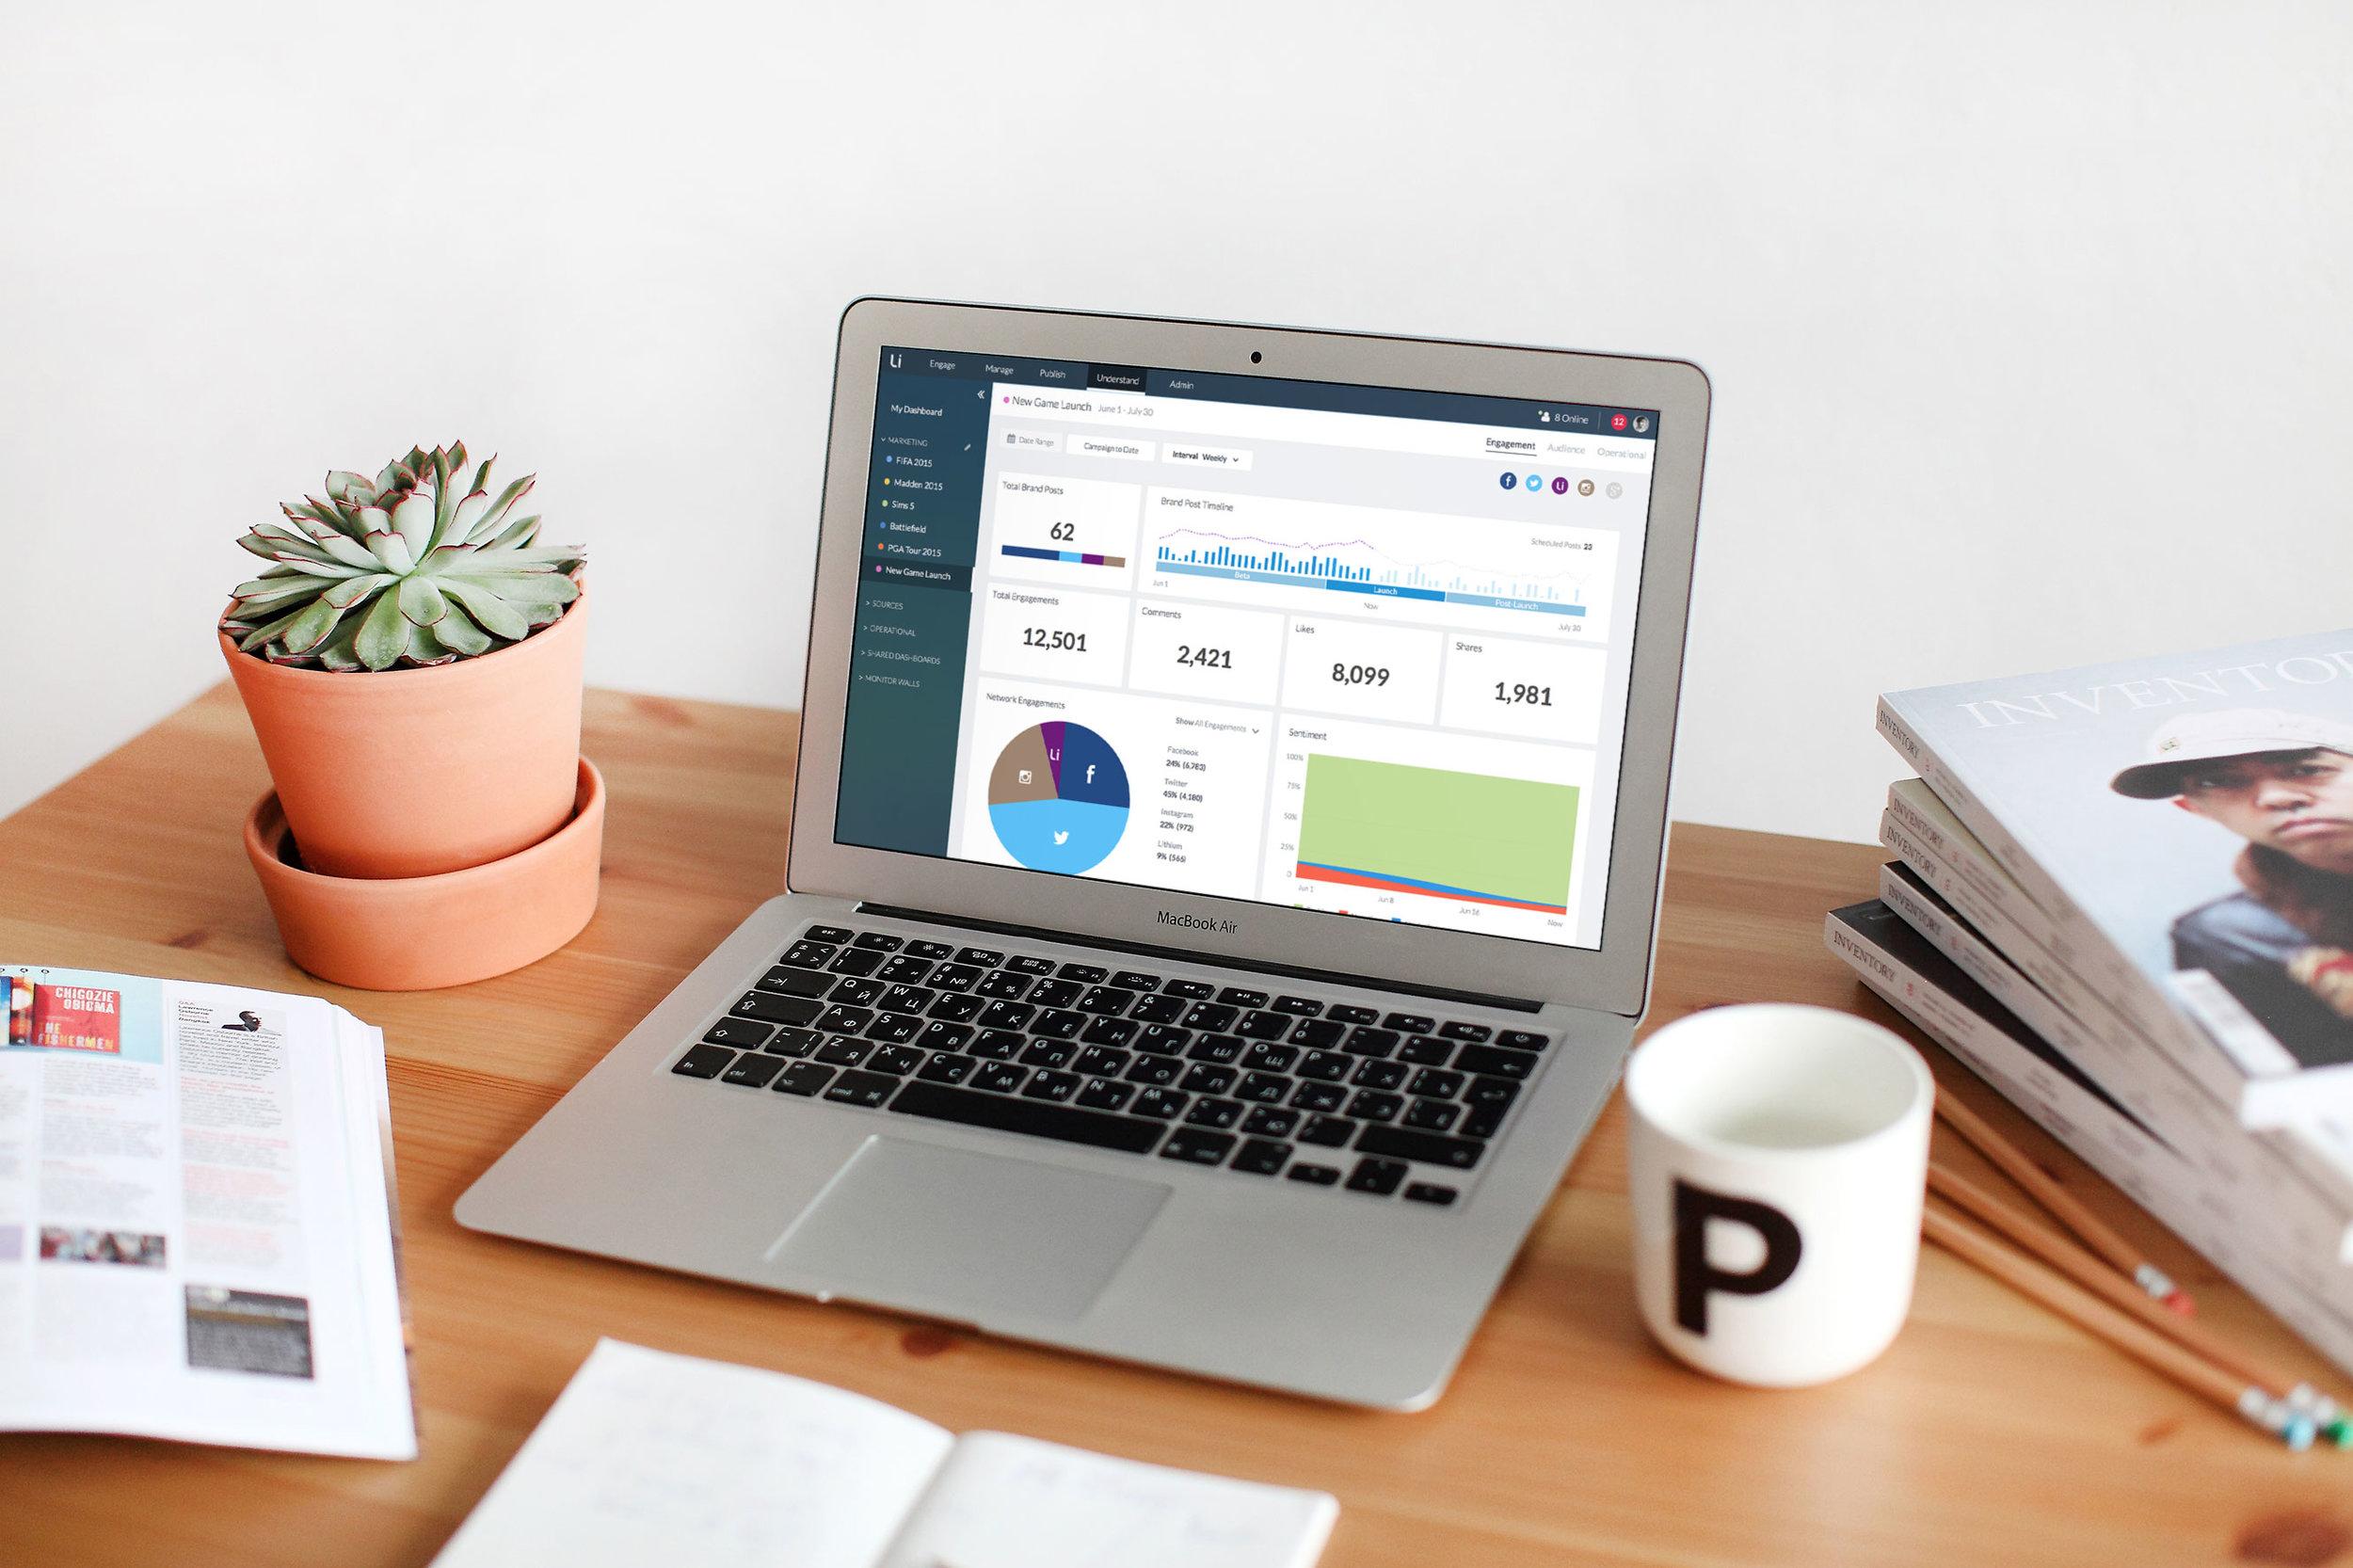 Lithium, Social Media Marketing Analytics Dashboard - Strategy, UX/UI, Wireframes, Remote Usability Testing